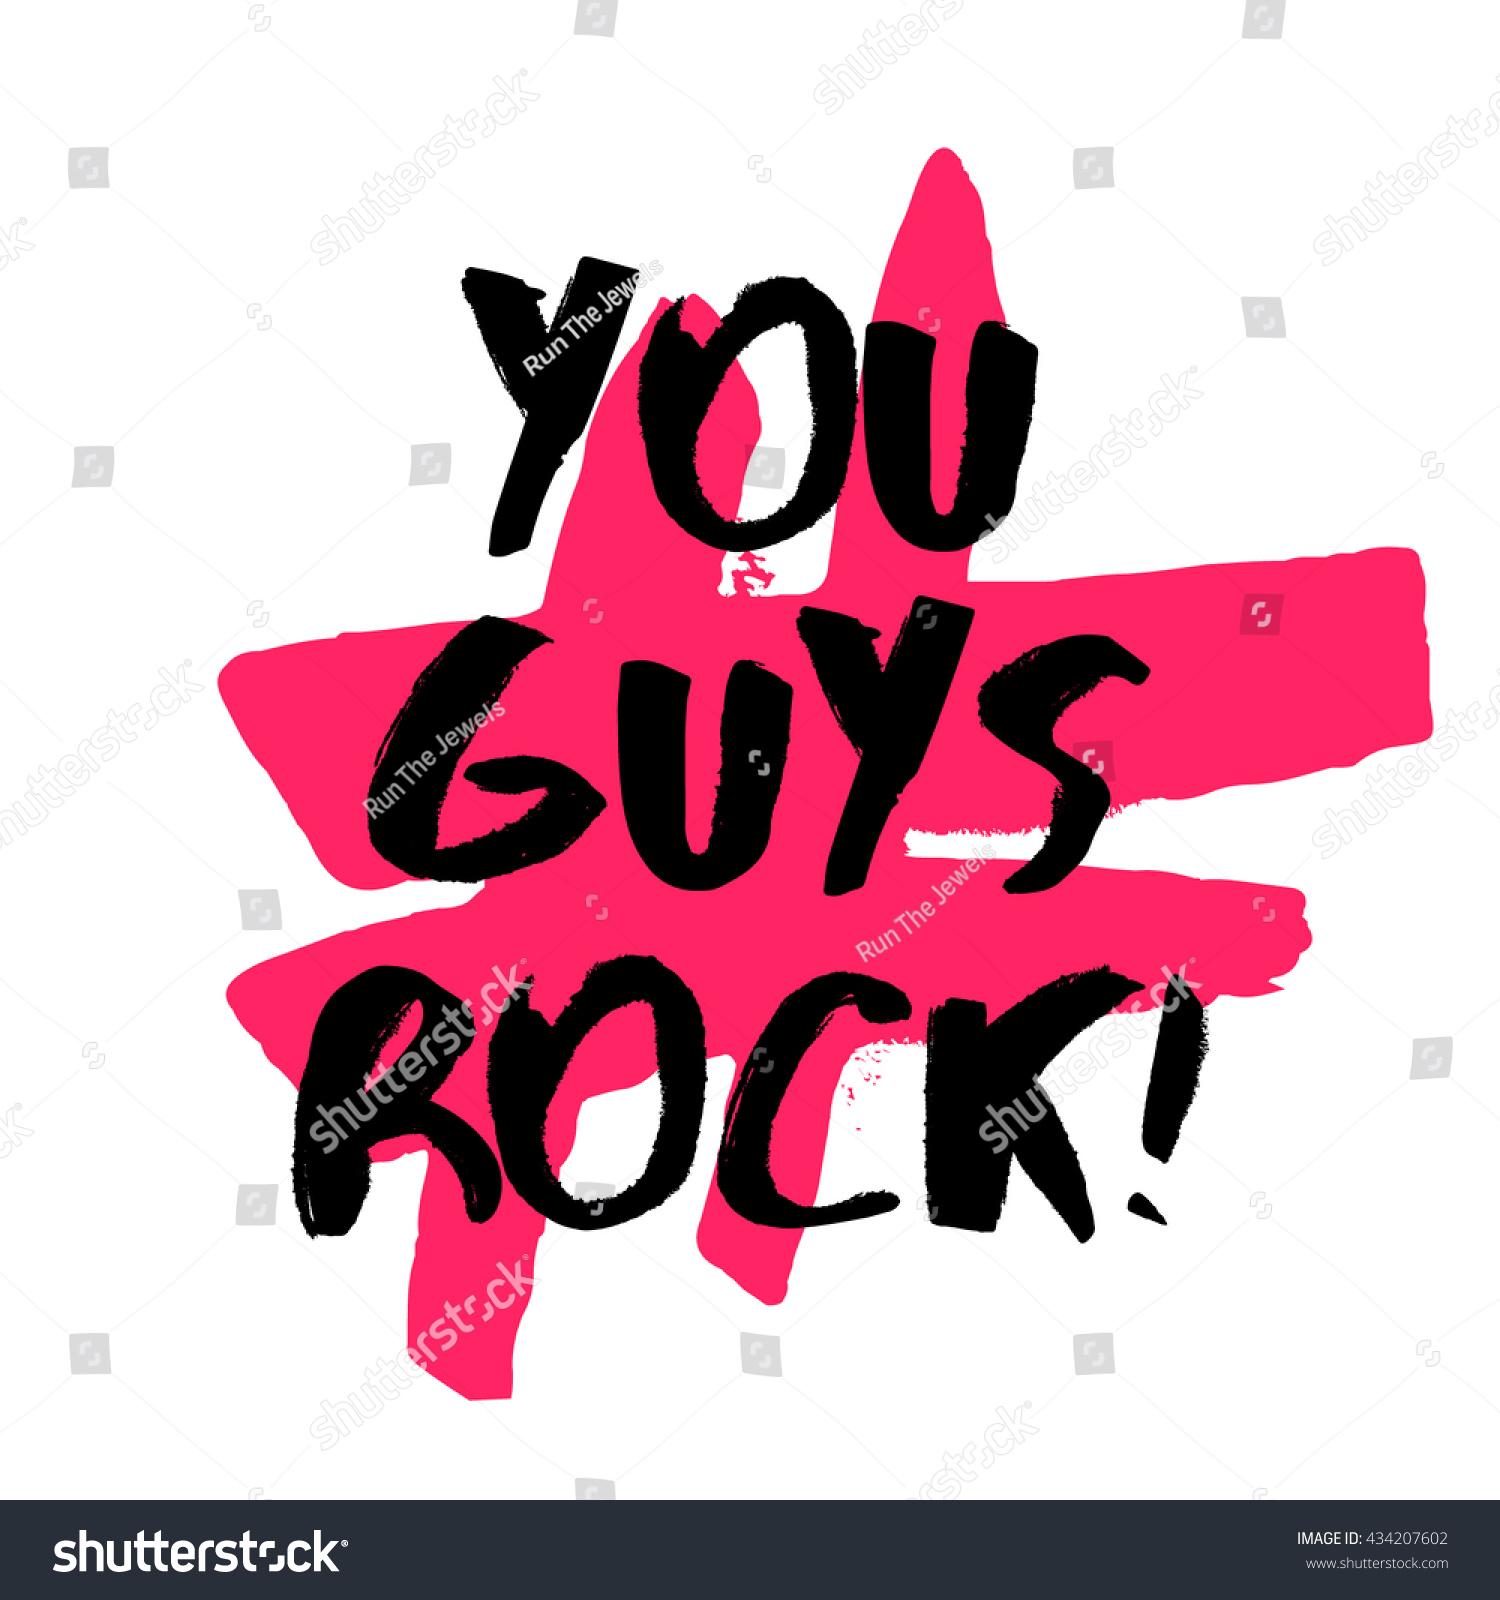 You Guys Rock Brush Lettering Vector Stock Vector